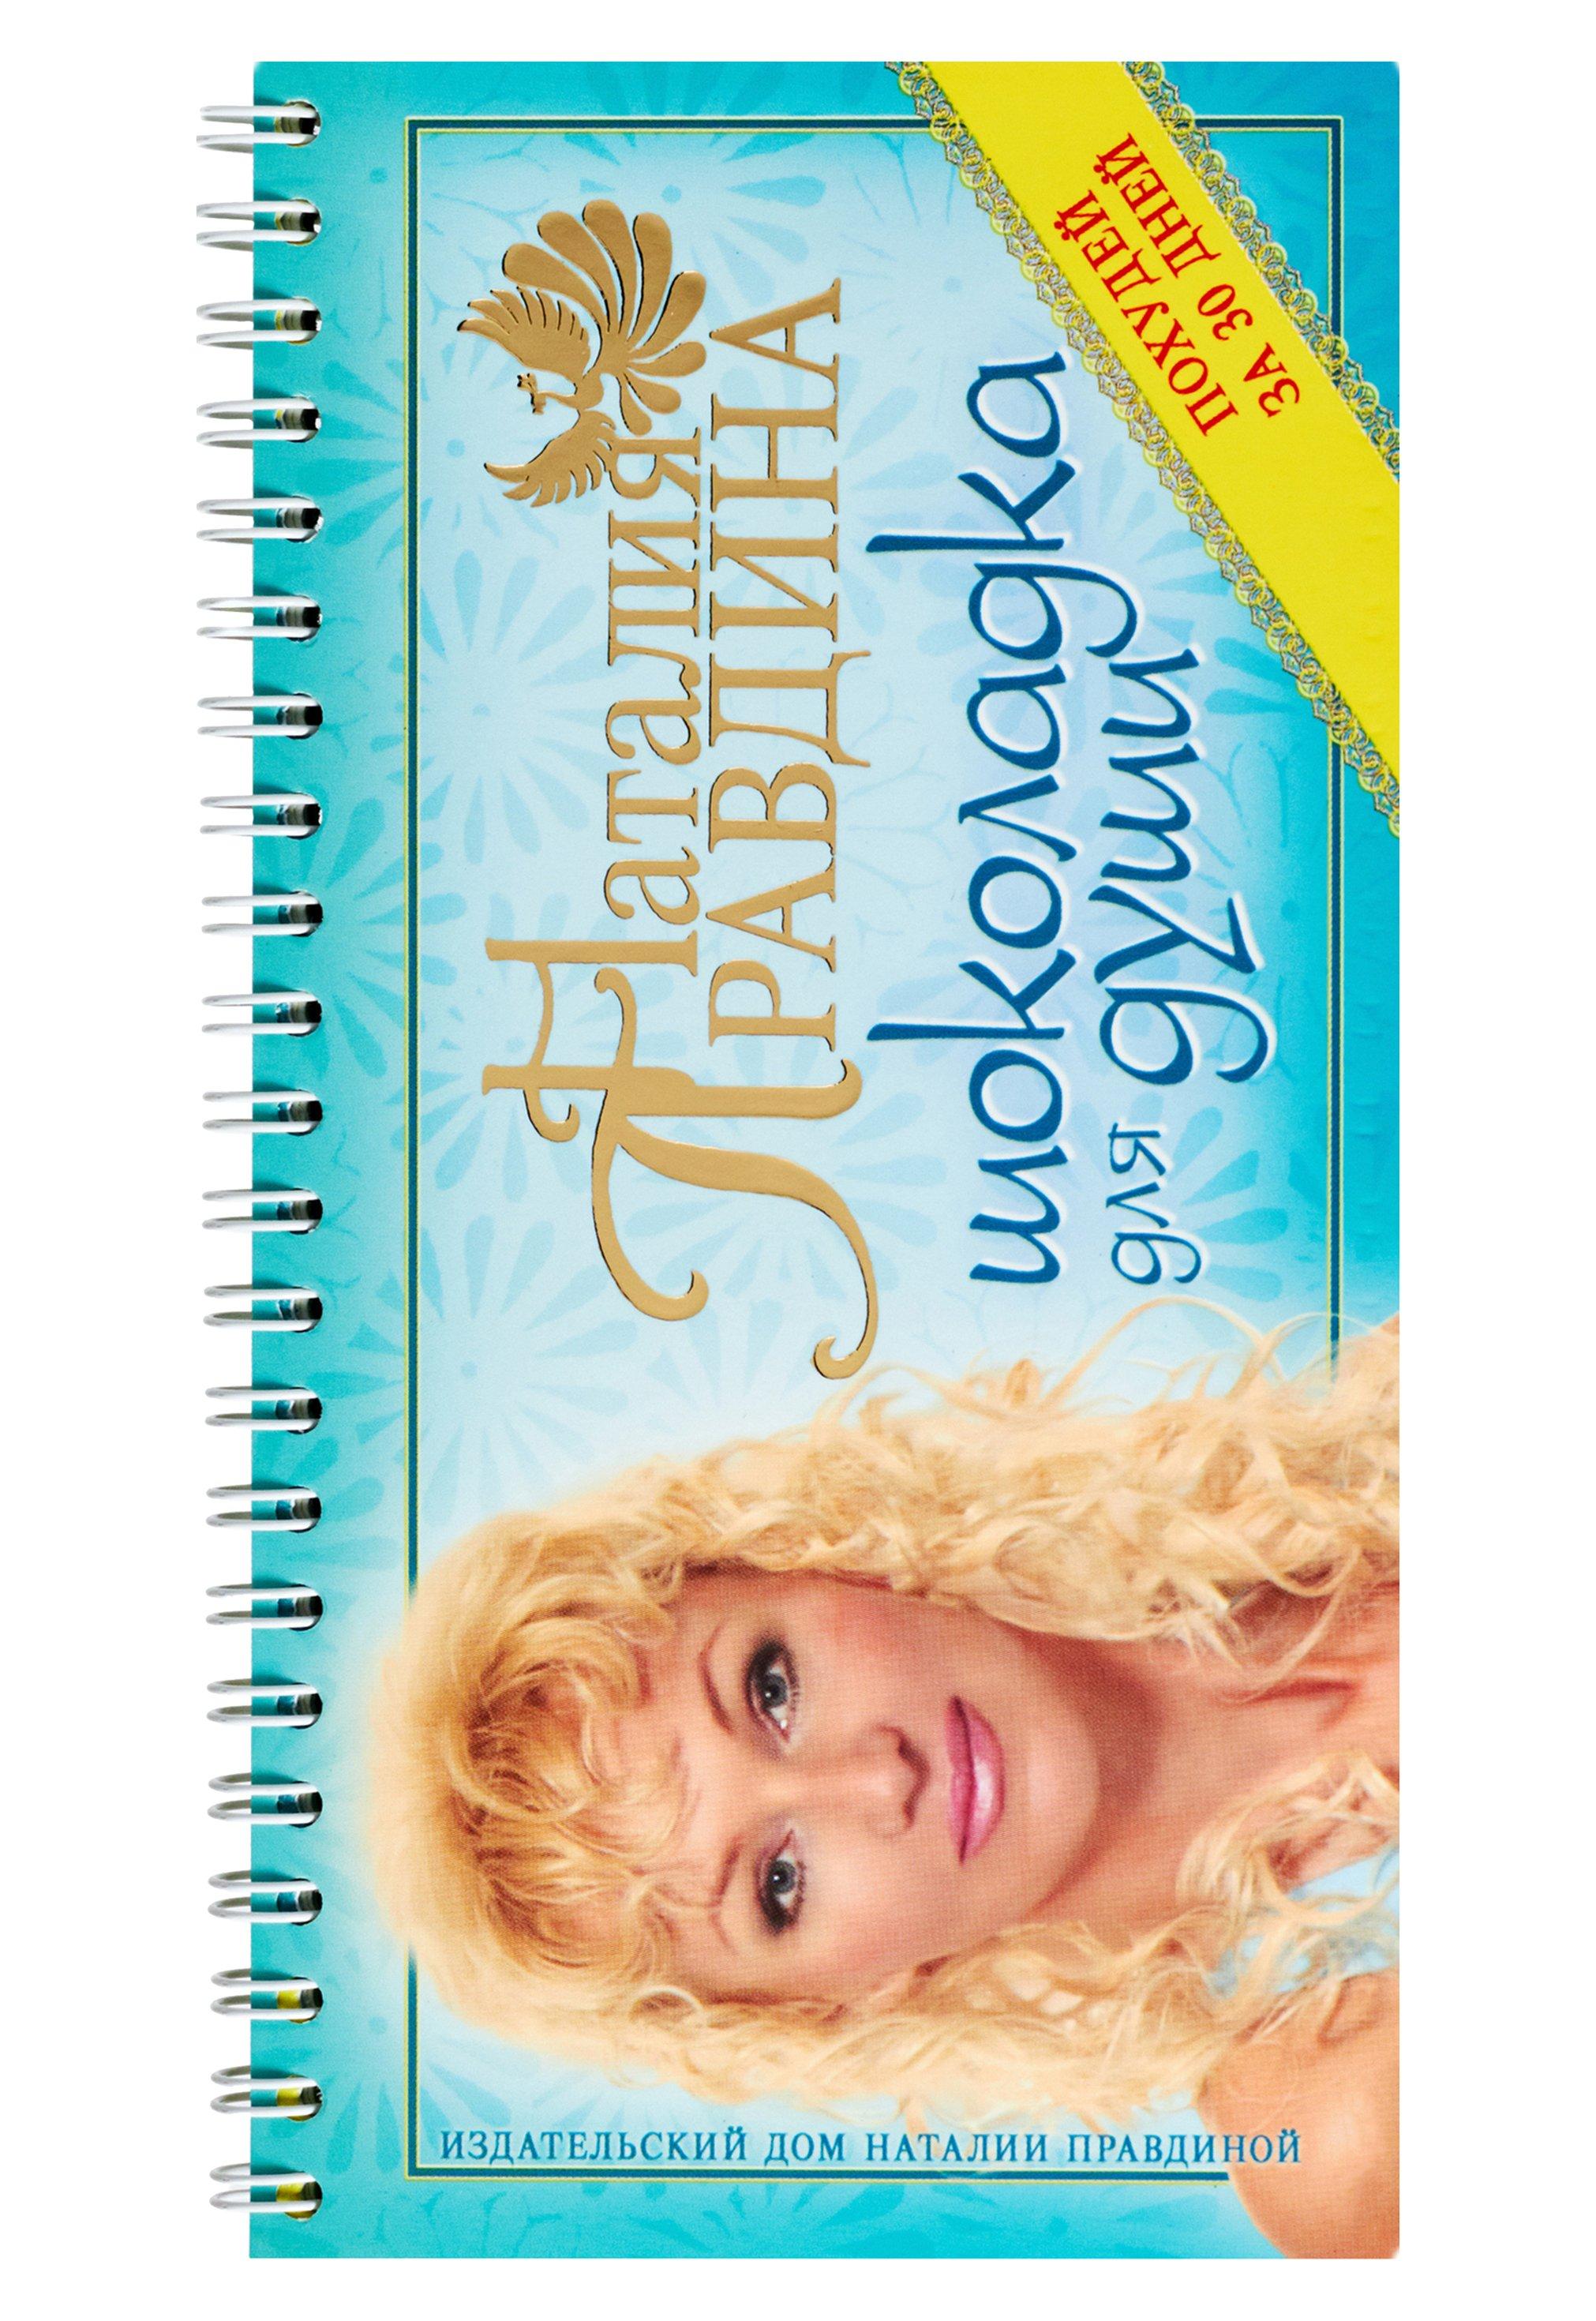 Правдина Наталия Борисовна Шоколадка для души, или похудей за 30 дней правдина наталия борисовна я самая красивая комплект из 3 х книг